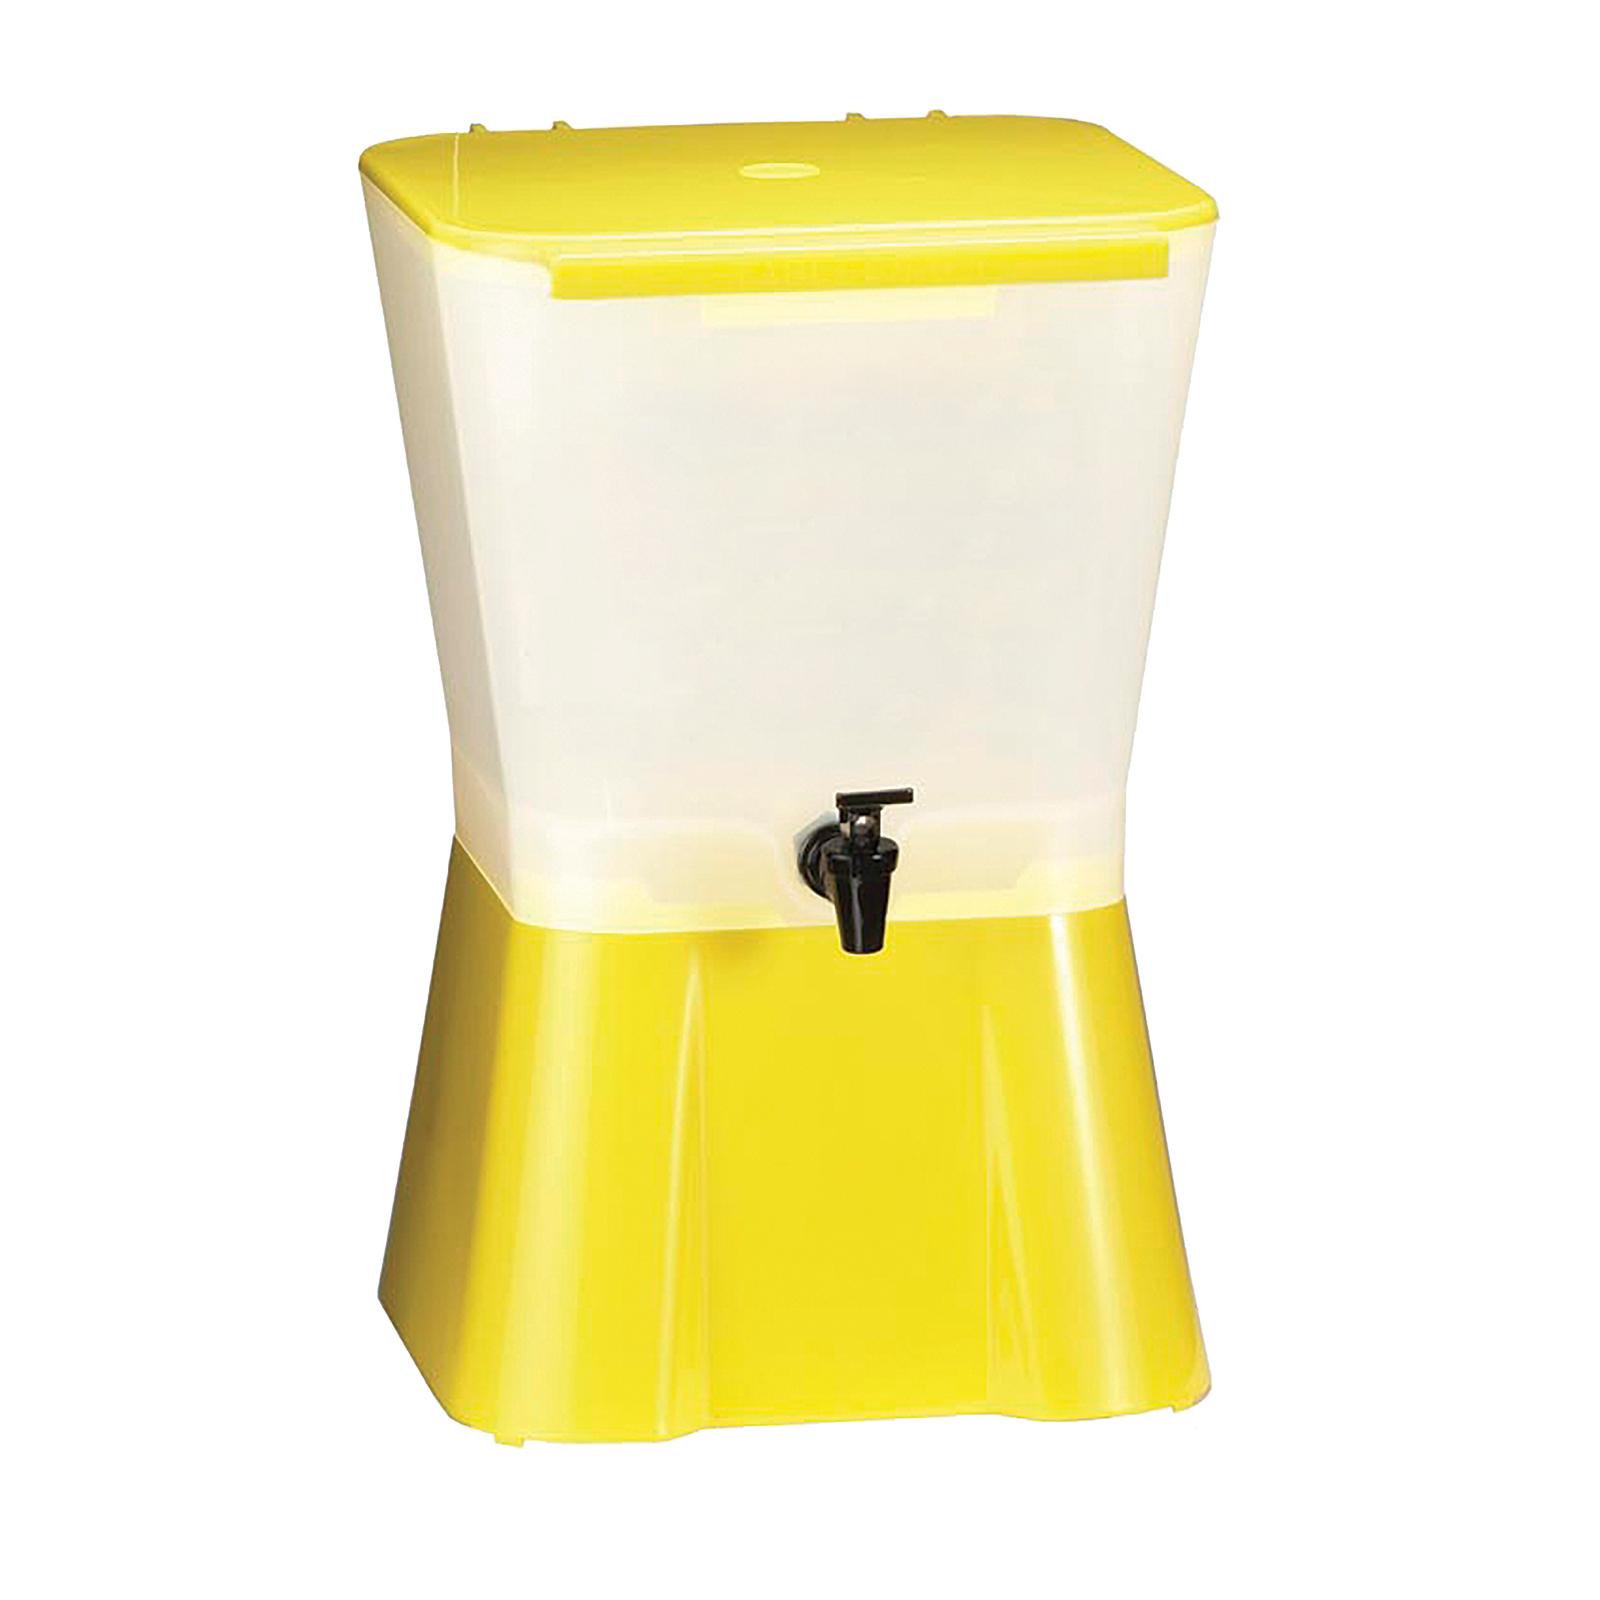 TableCraft Products 955B beverage dispenser, stand